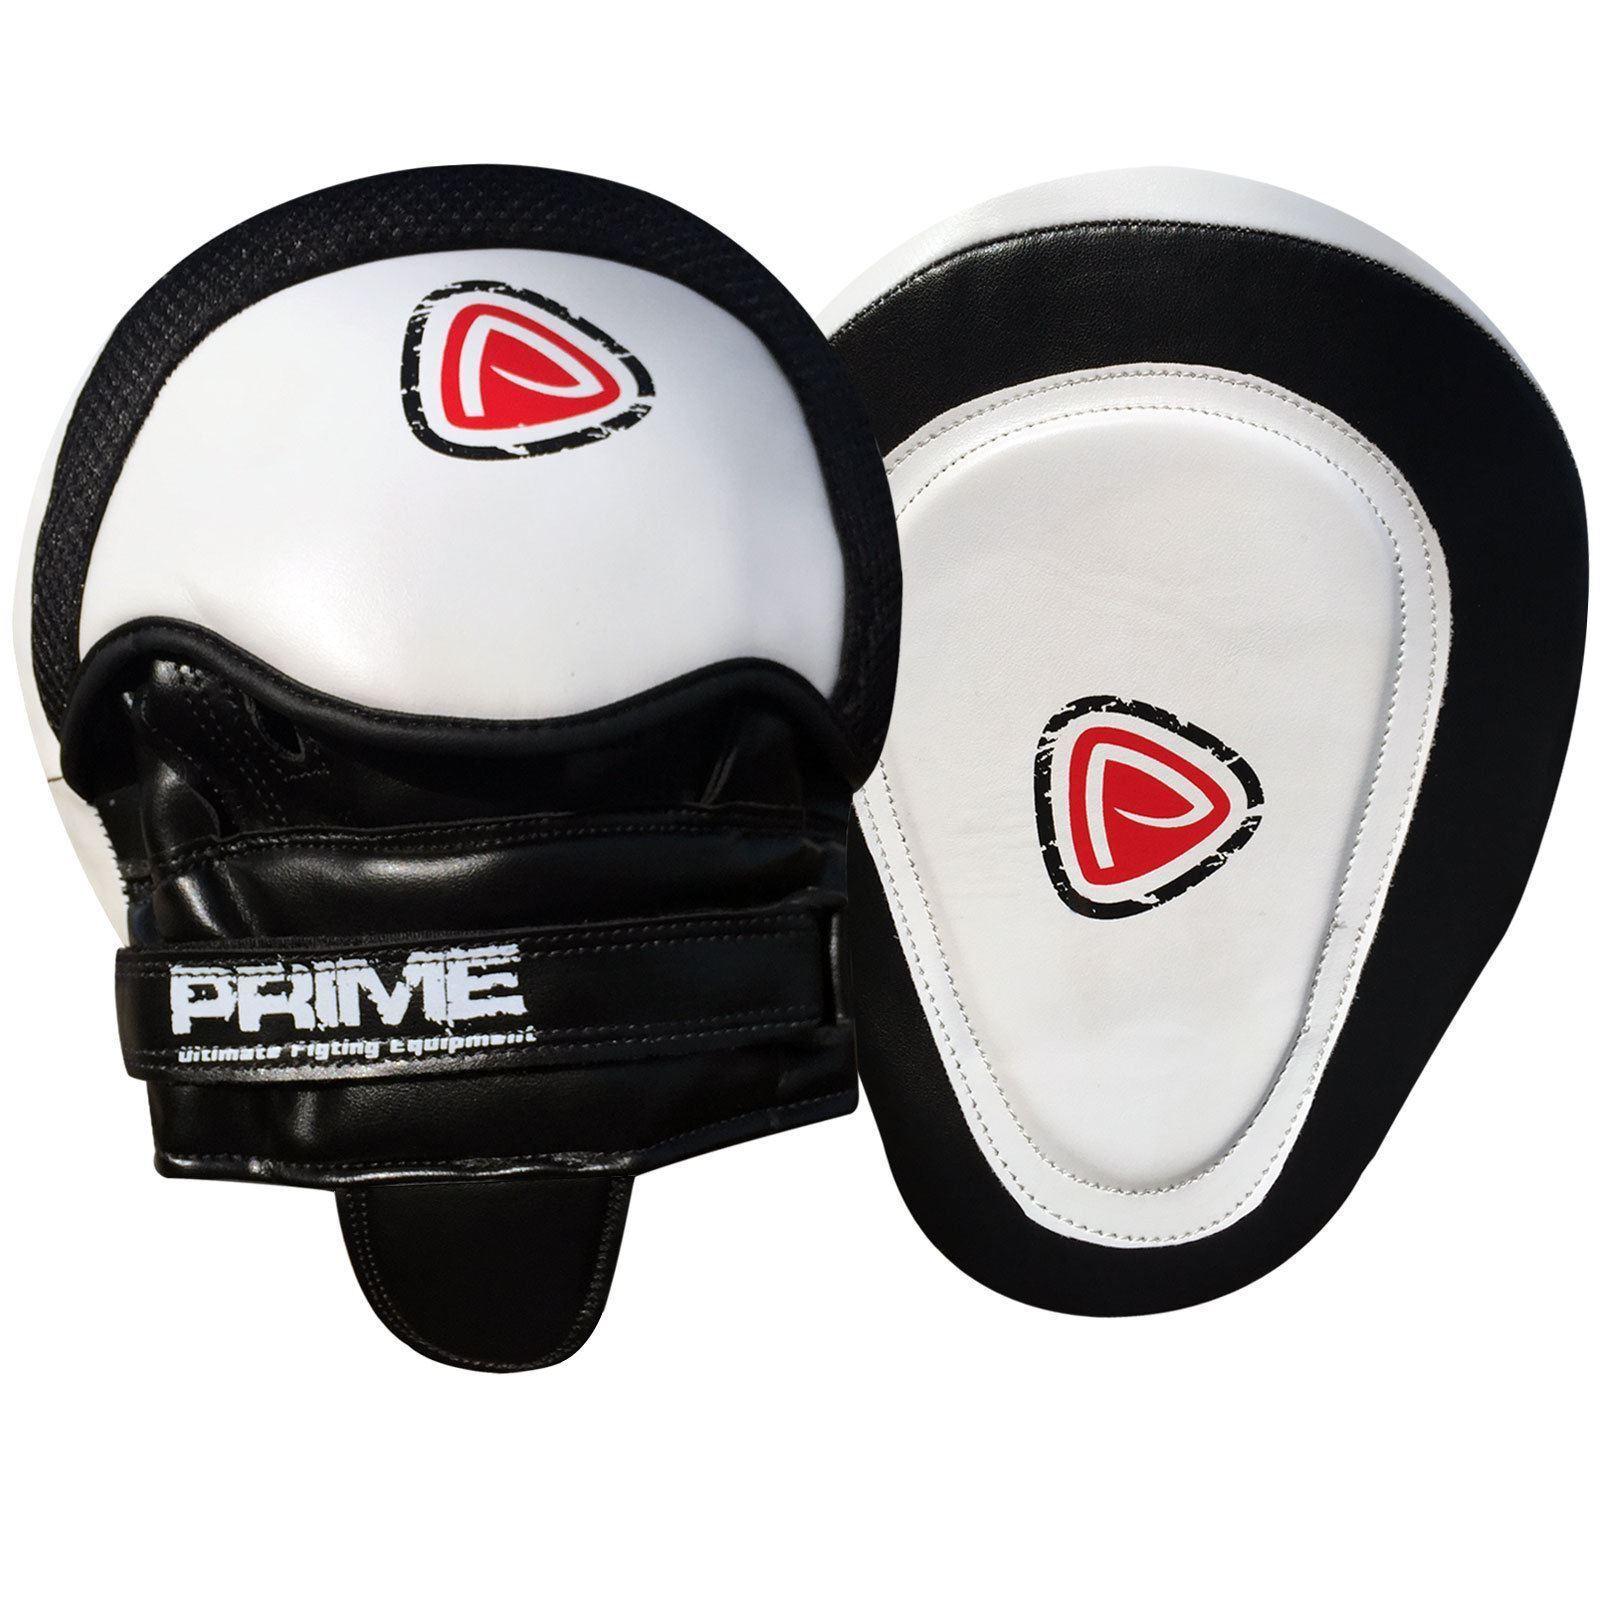 Junior Kids Boxing Boxing SET Boxing Kids Uniform Boxing Gloves Focus Pads Age 3-14 Years 15ac12